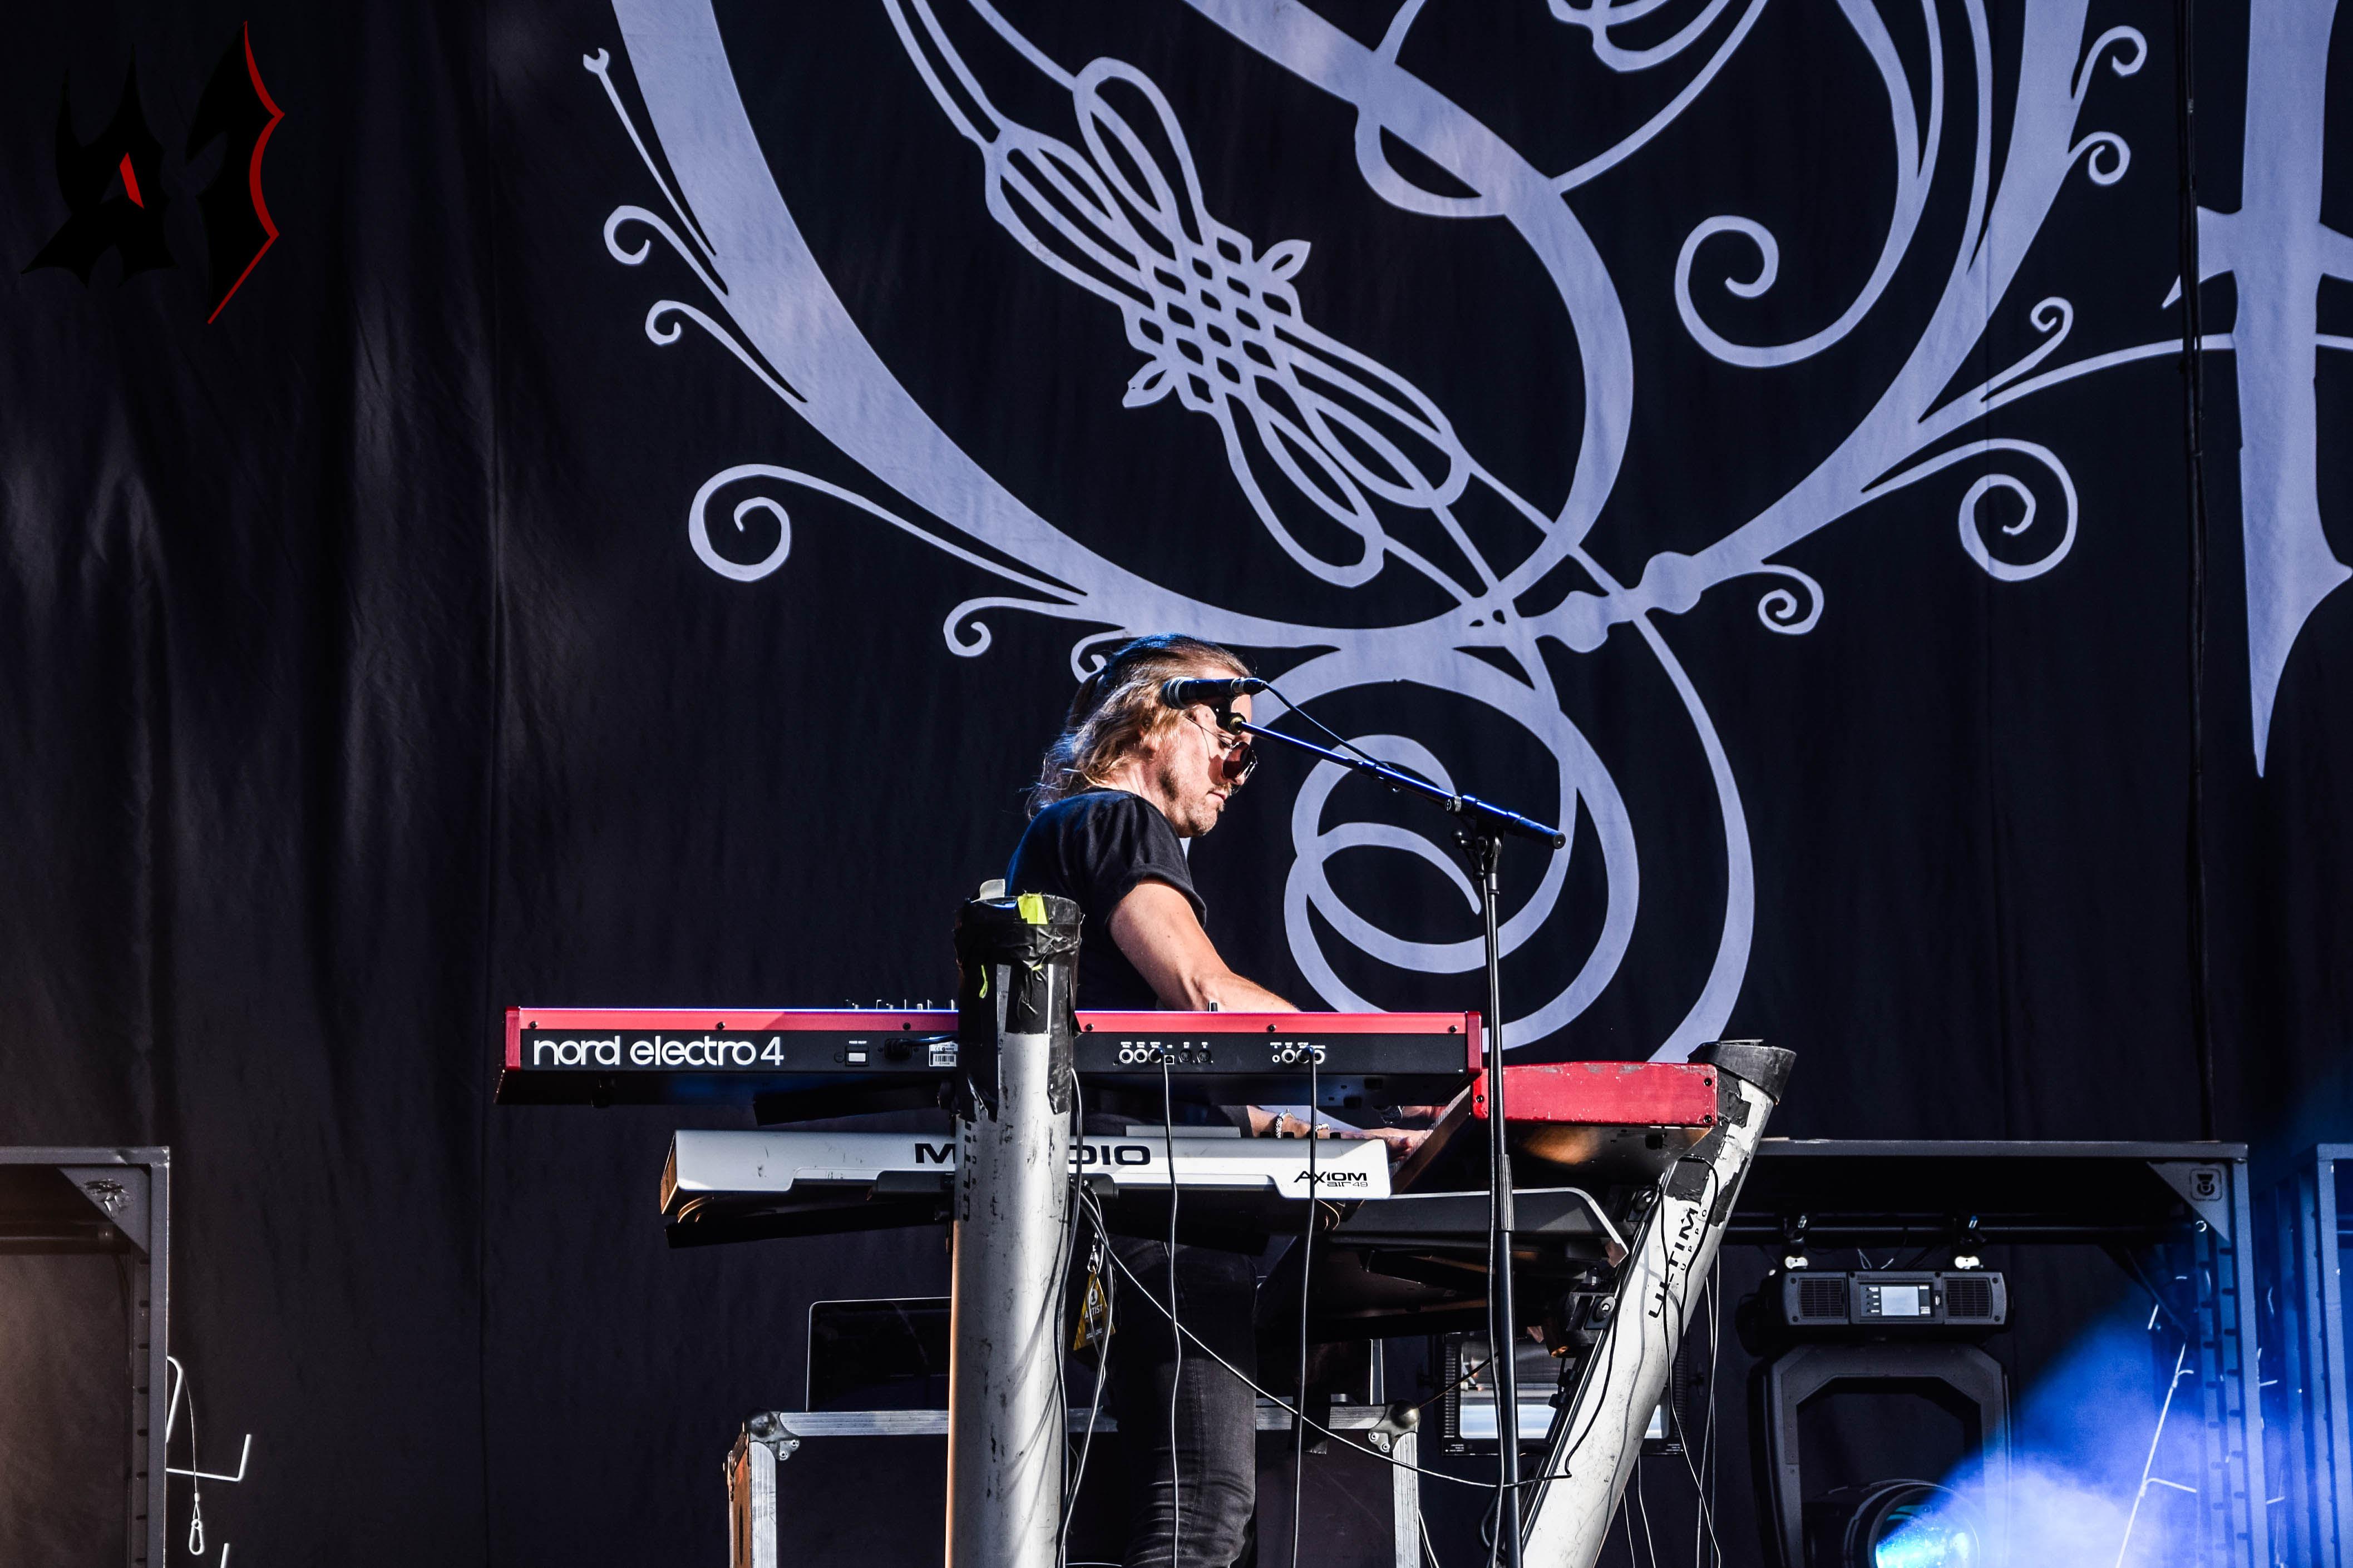 Donwload 2018 – Day 1 - Opeth 13